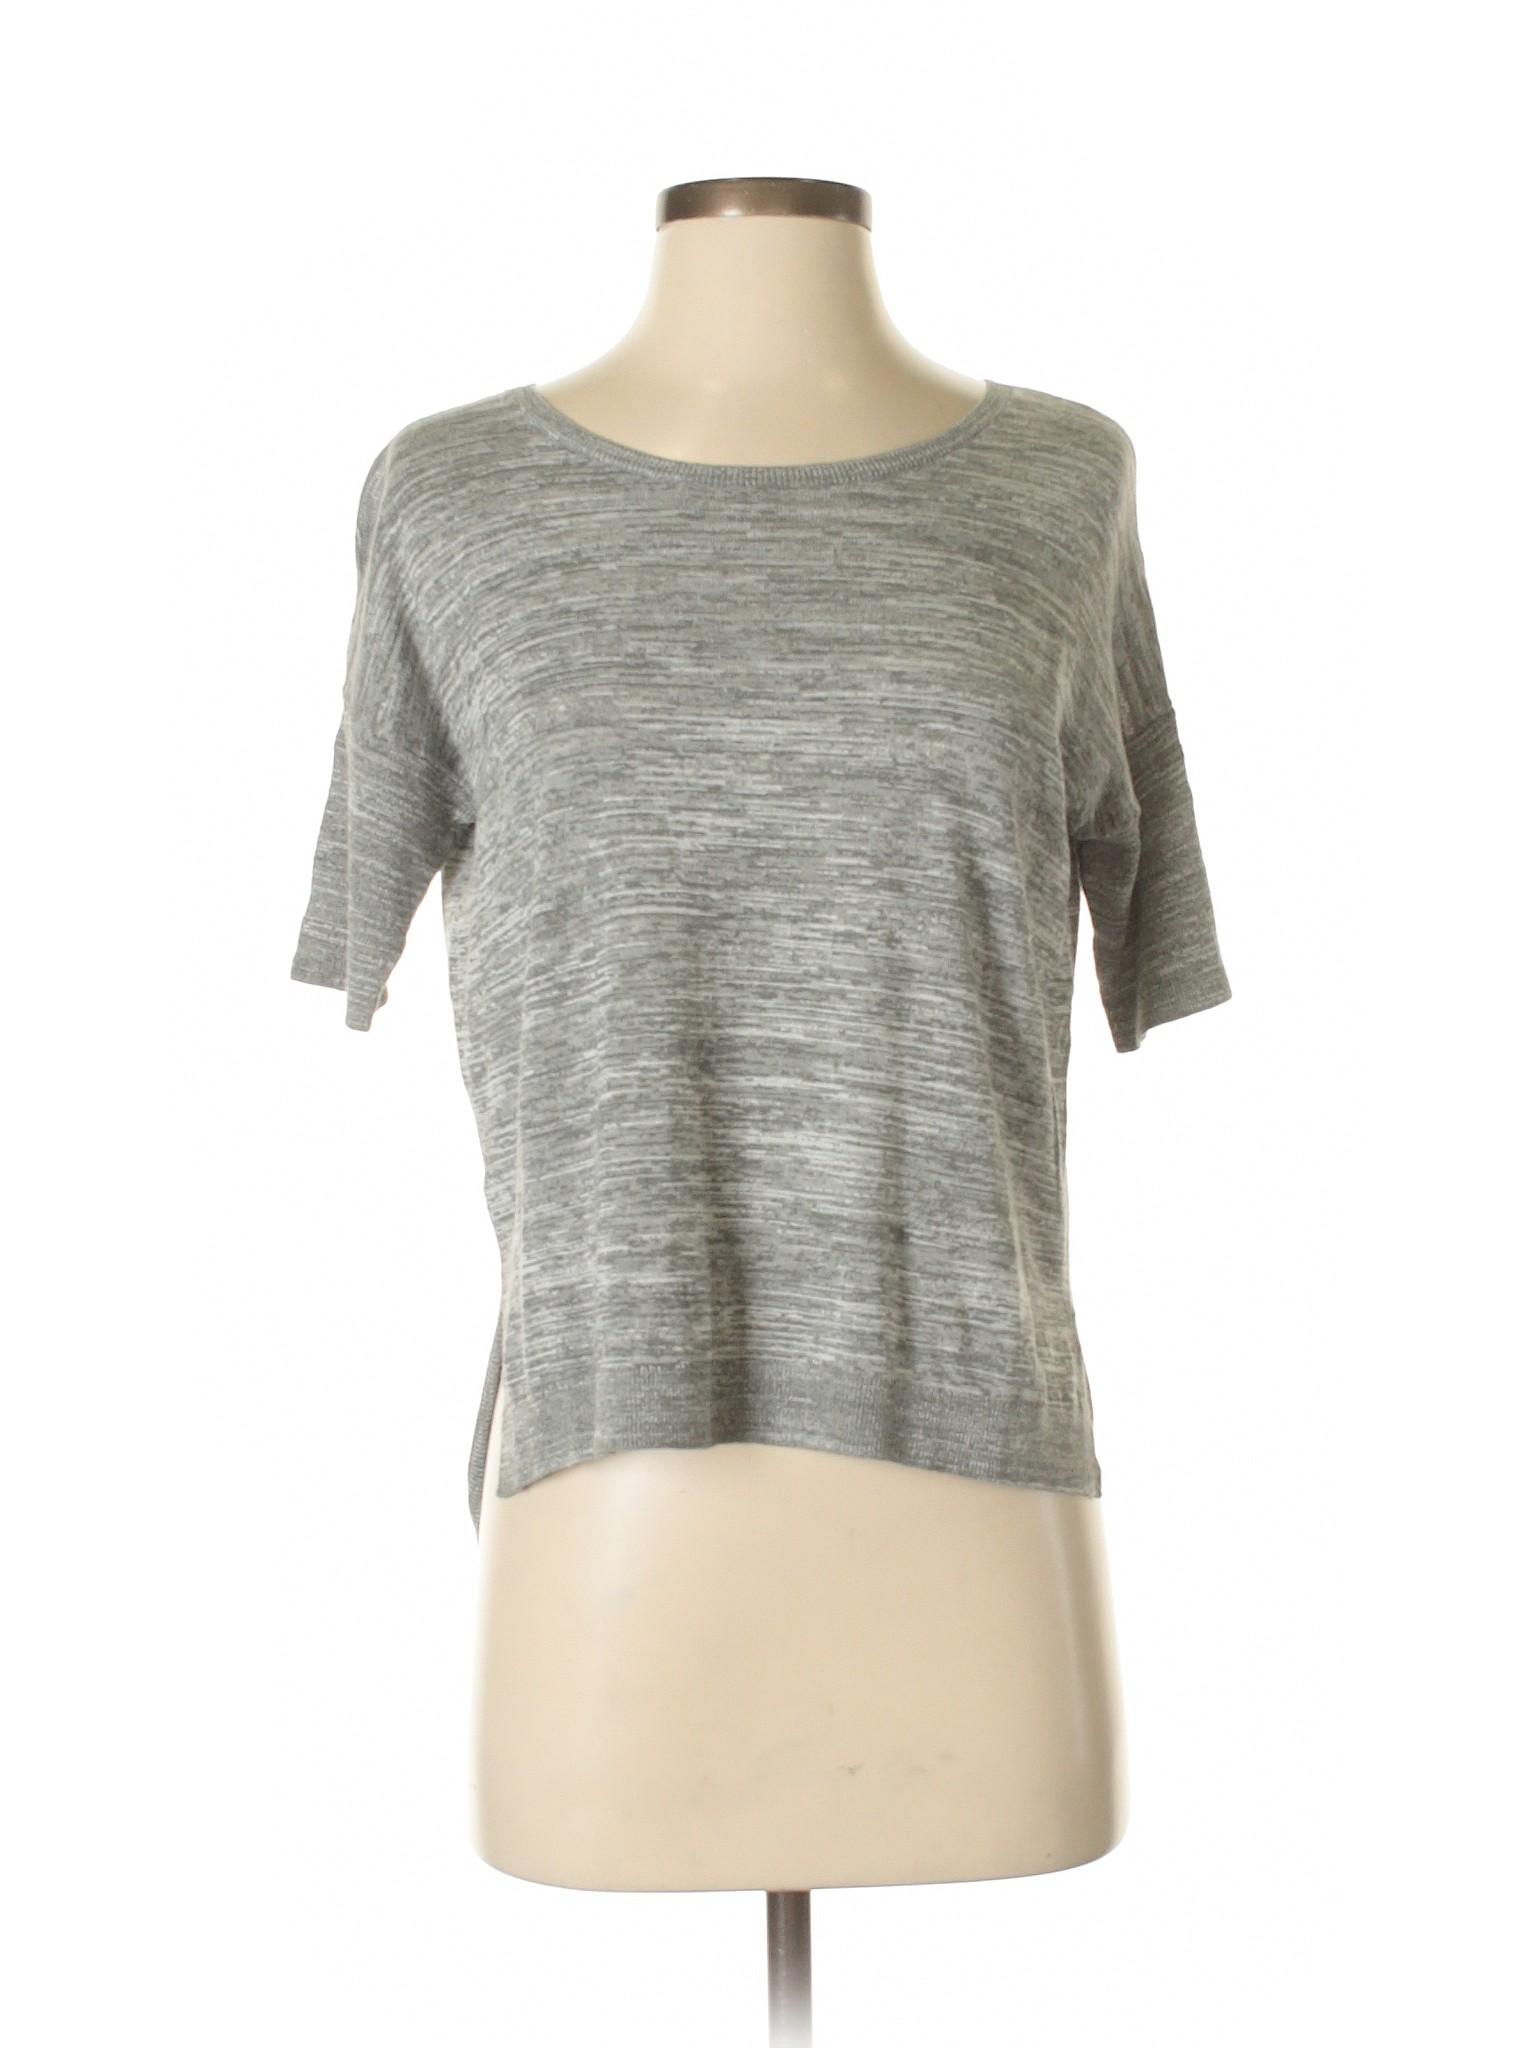 Boutique Ann Sweater LOFT Taylor Pullover r8wqdwI